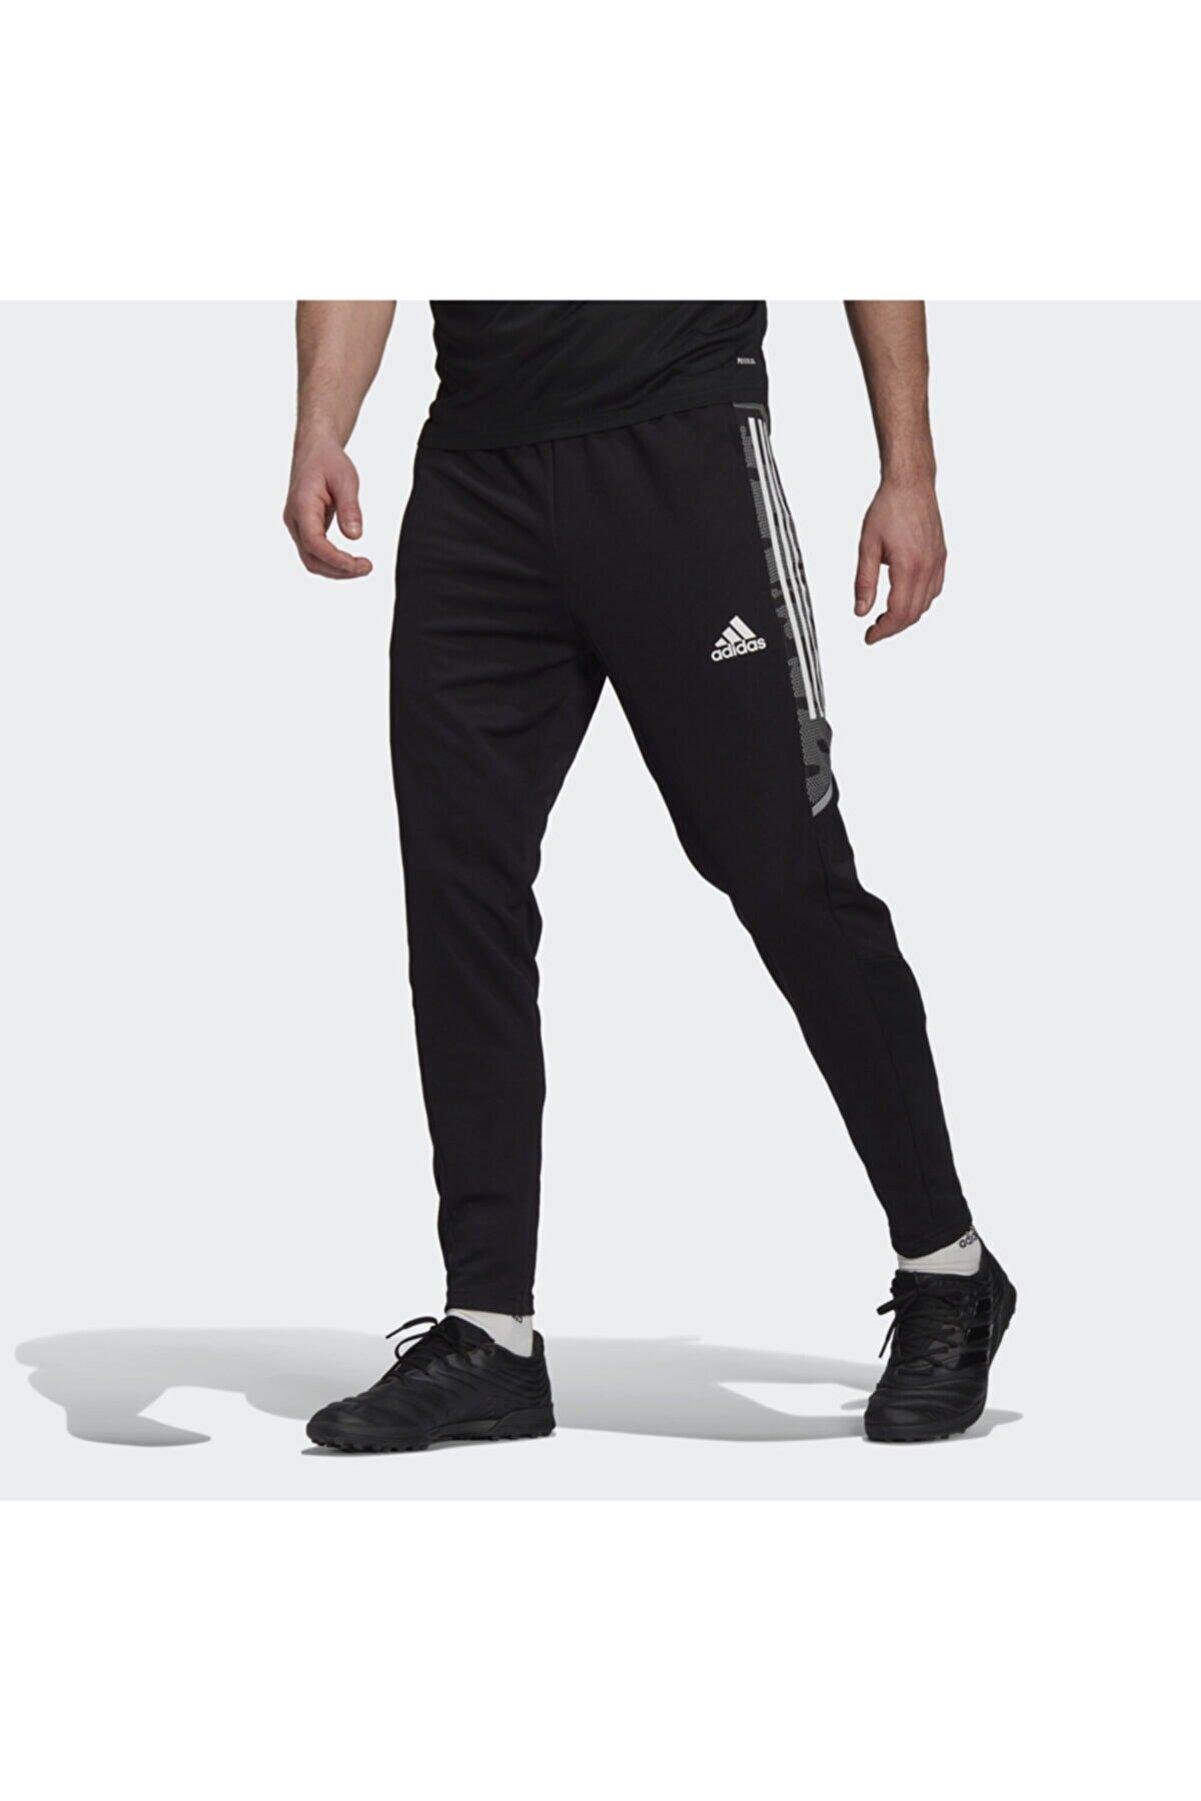 adidas Erkek Siyah Condivo 21 Primeblue Training Eşofman Altı